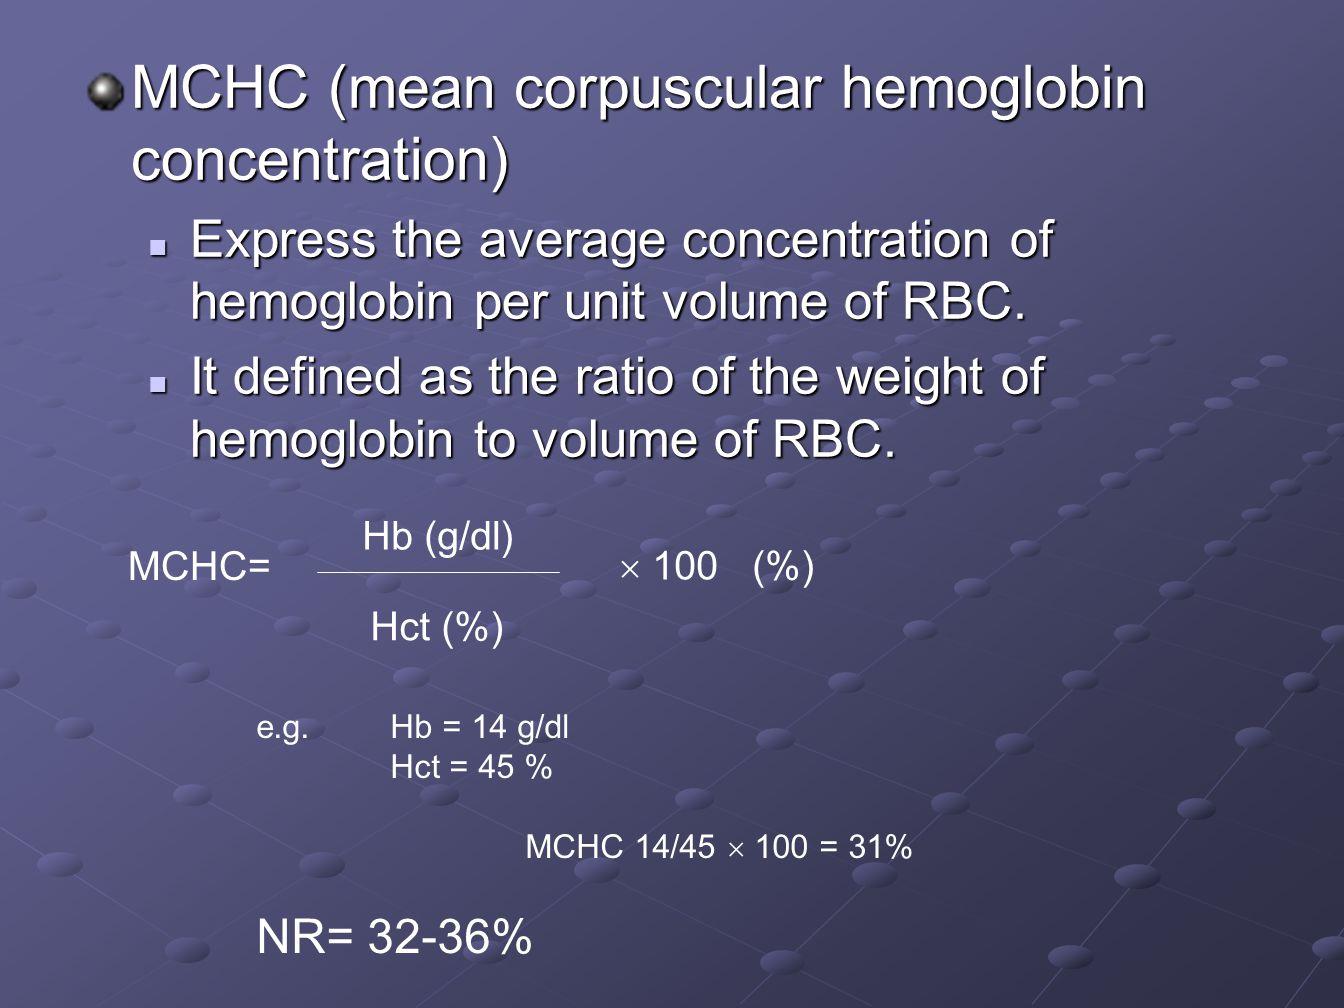 MCHC (mean corpuscular hemoglobin concentration) Express the average concentration of hemoglobin per unit volume of RBC. Express the average concentra